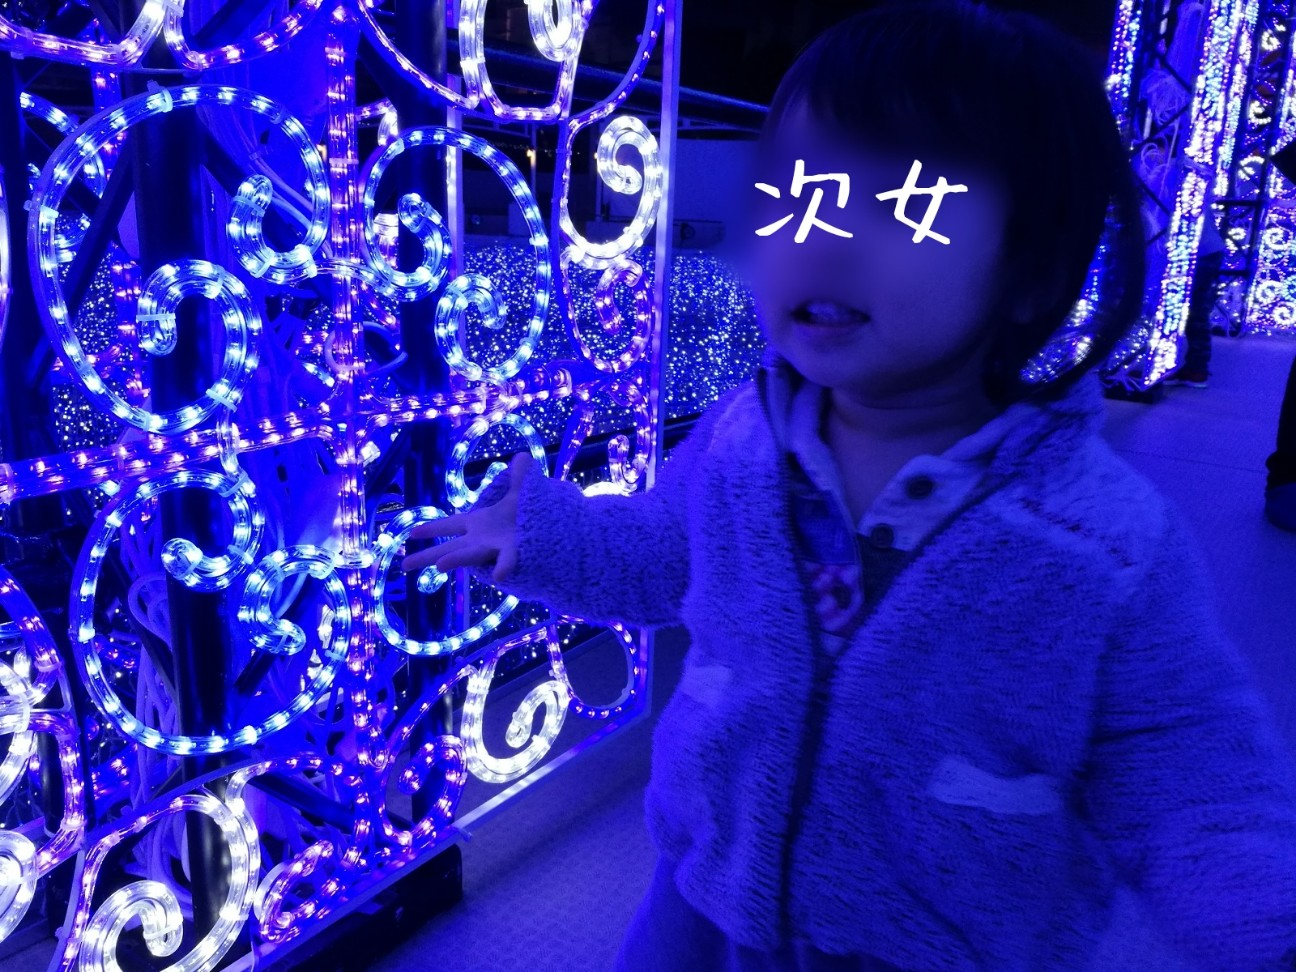 f:id:kodomo-to-dokoiko:20180126004700j:image